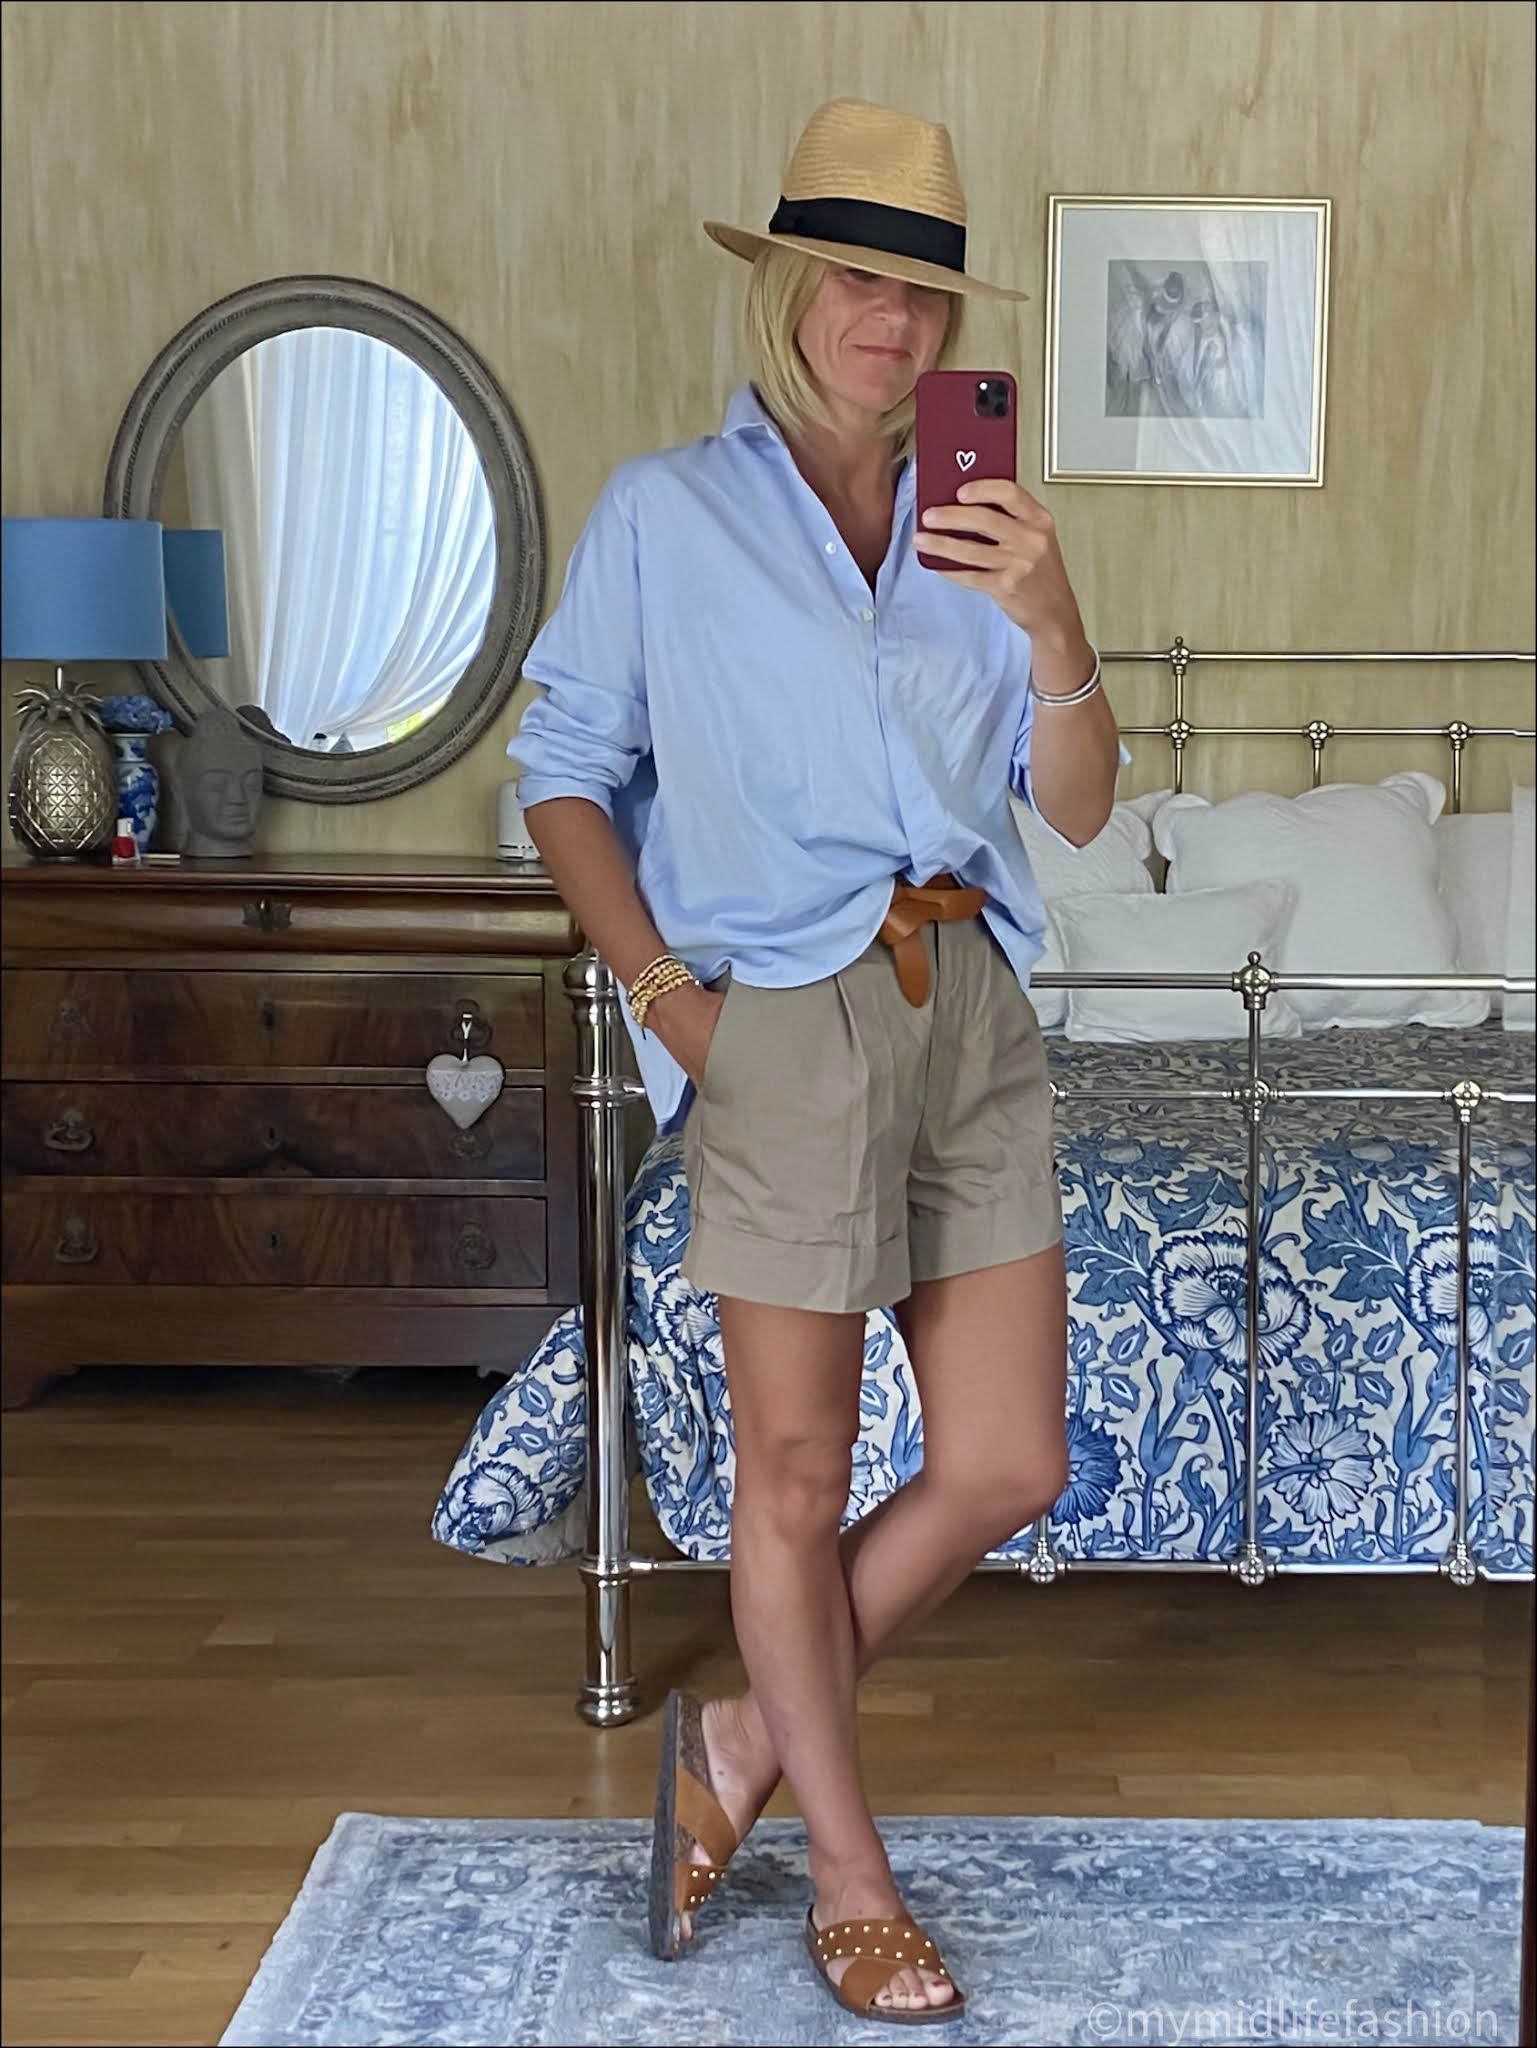 my midlife fashion, h and m Panama hat, Uterque oversized shirt, Isabel Marant lecce belt, h and m chino shorts, basalt studded sliders